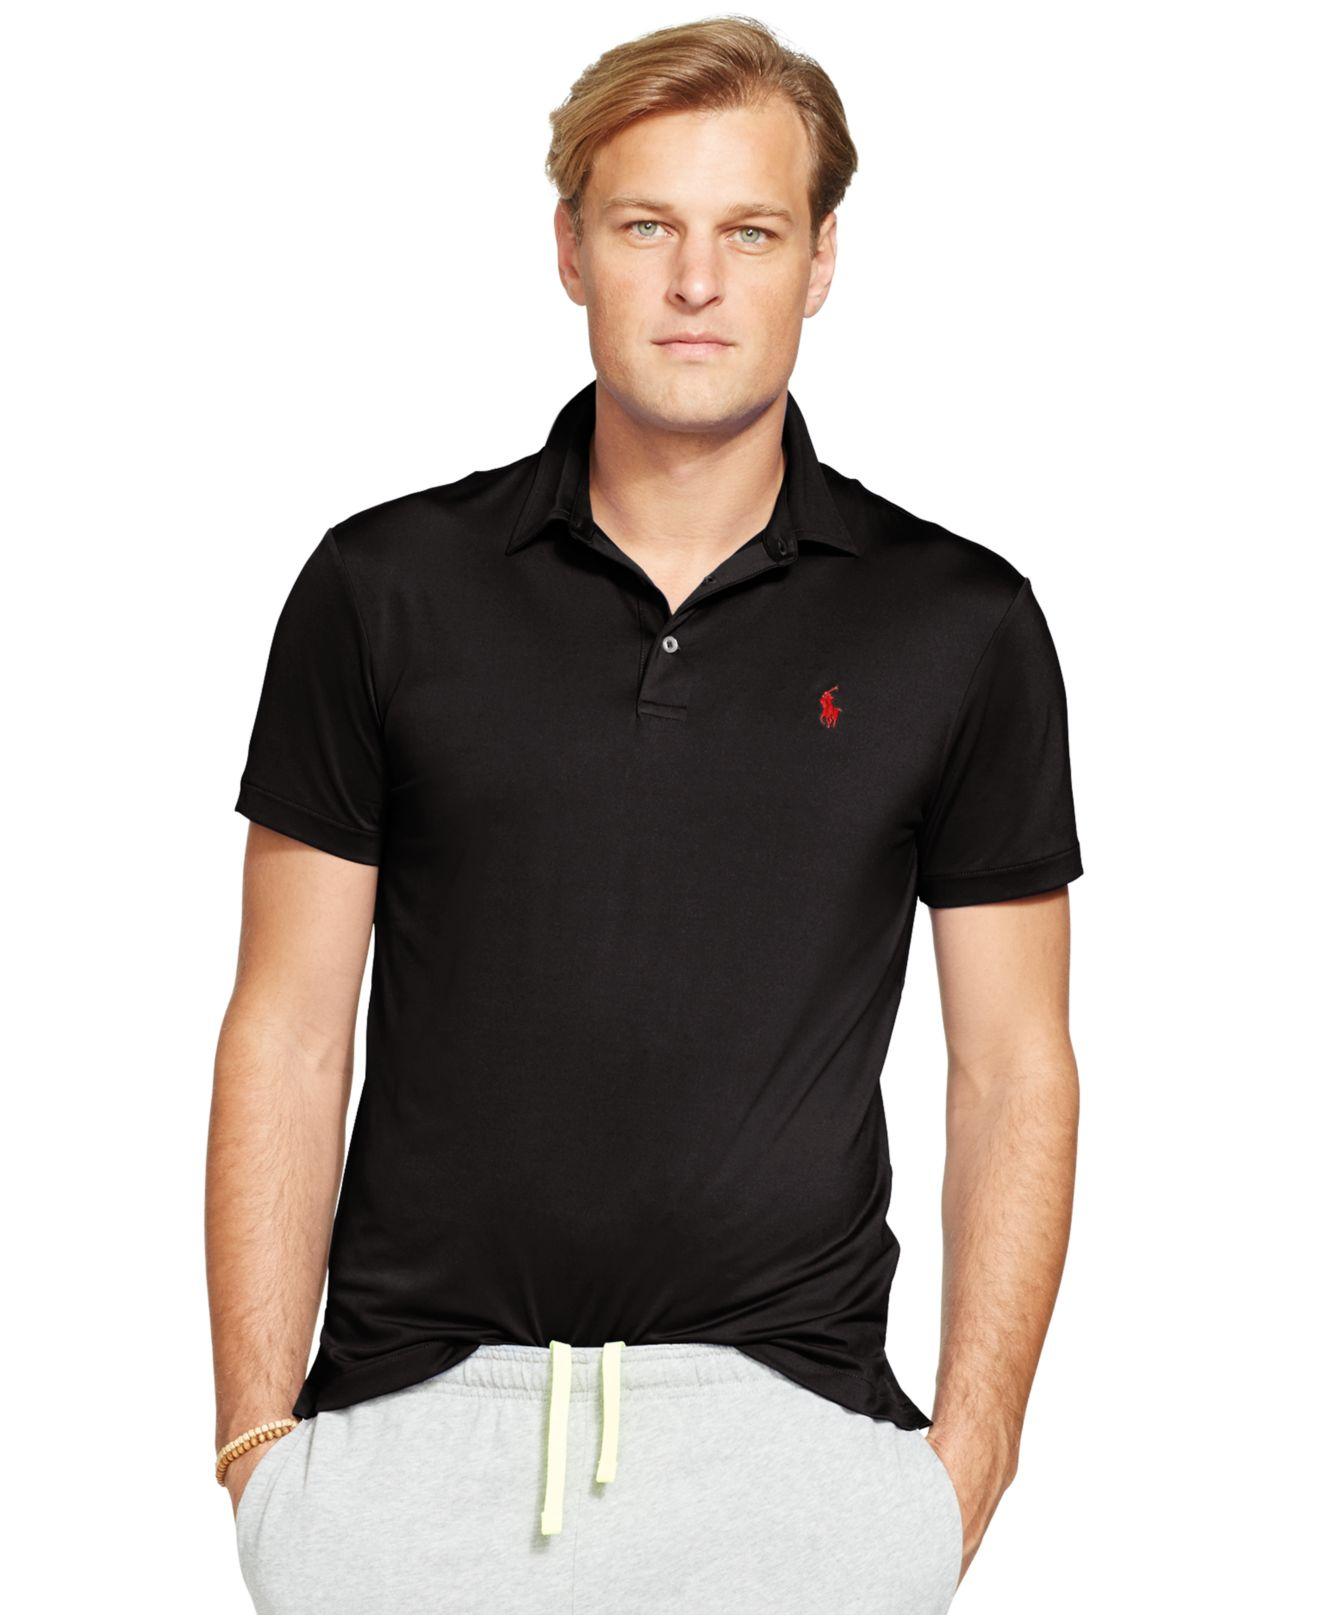 c26056c65b9 Lyst - Polo Ralph Lauren Big   Tall Performance Polo Shirt in Black ...